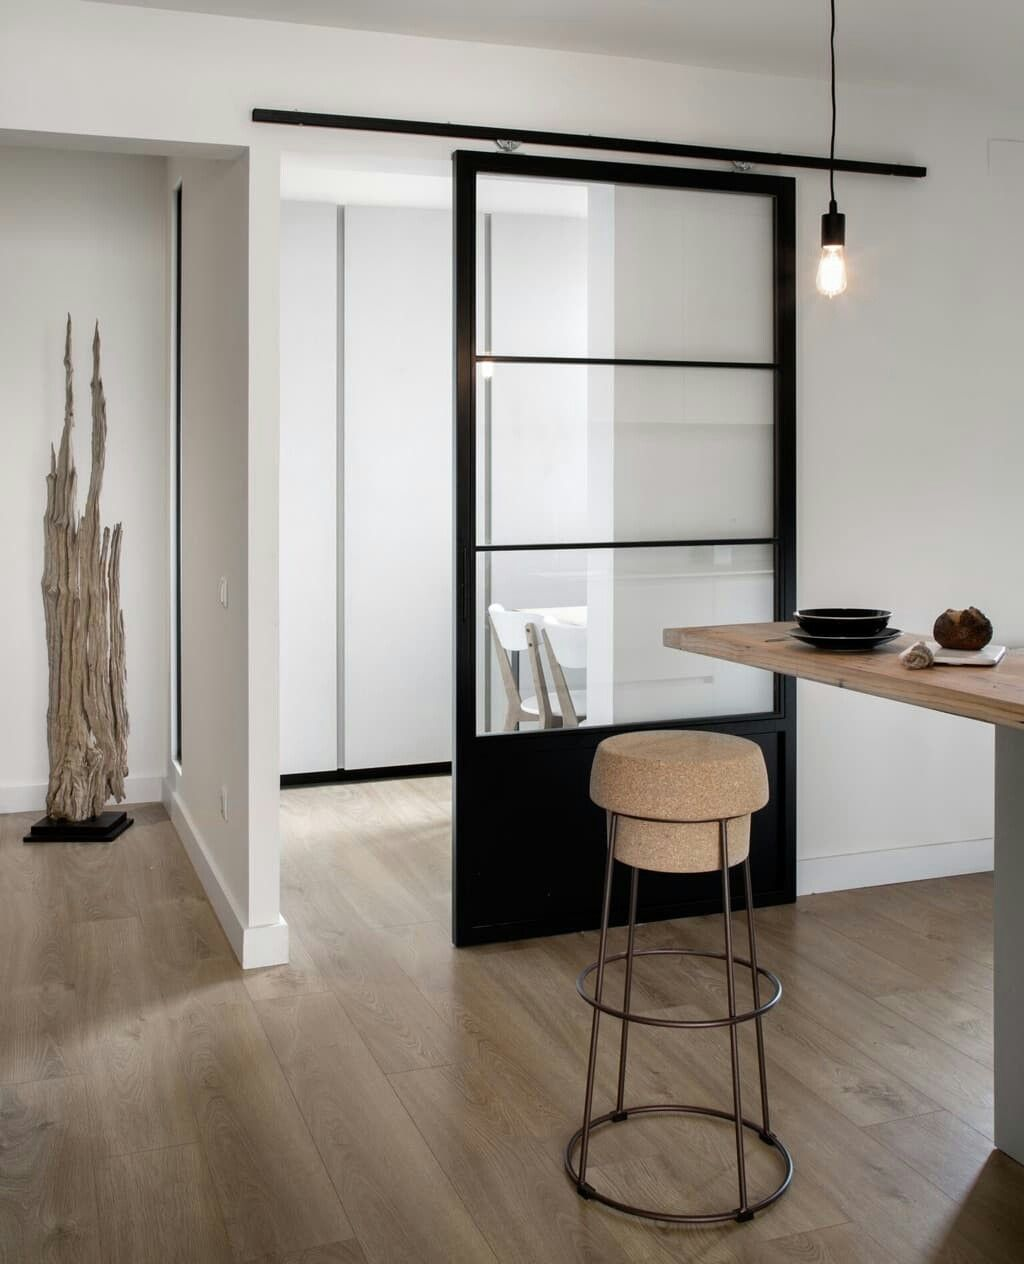 Barn doors office | Barn doors | Pinterest